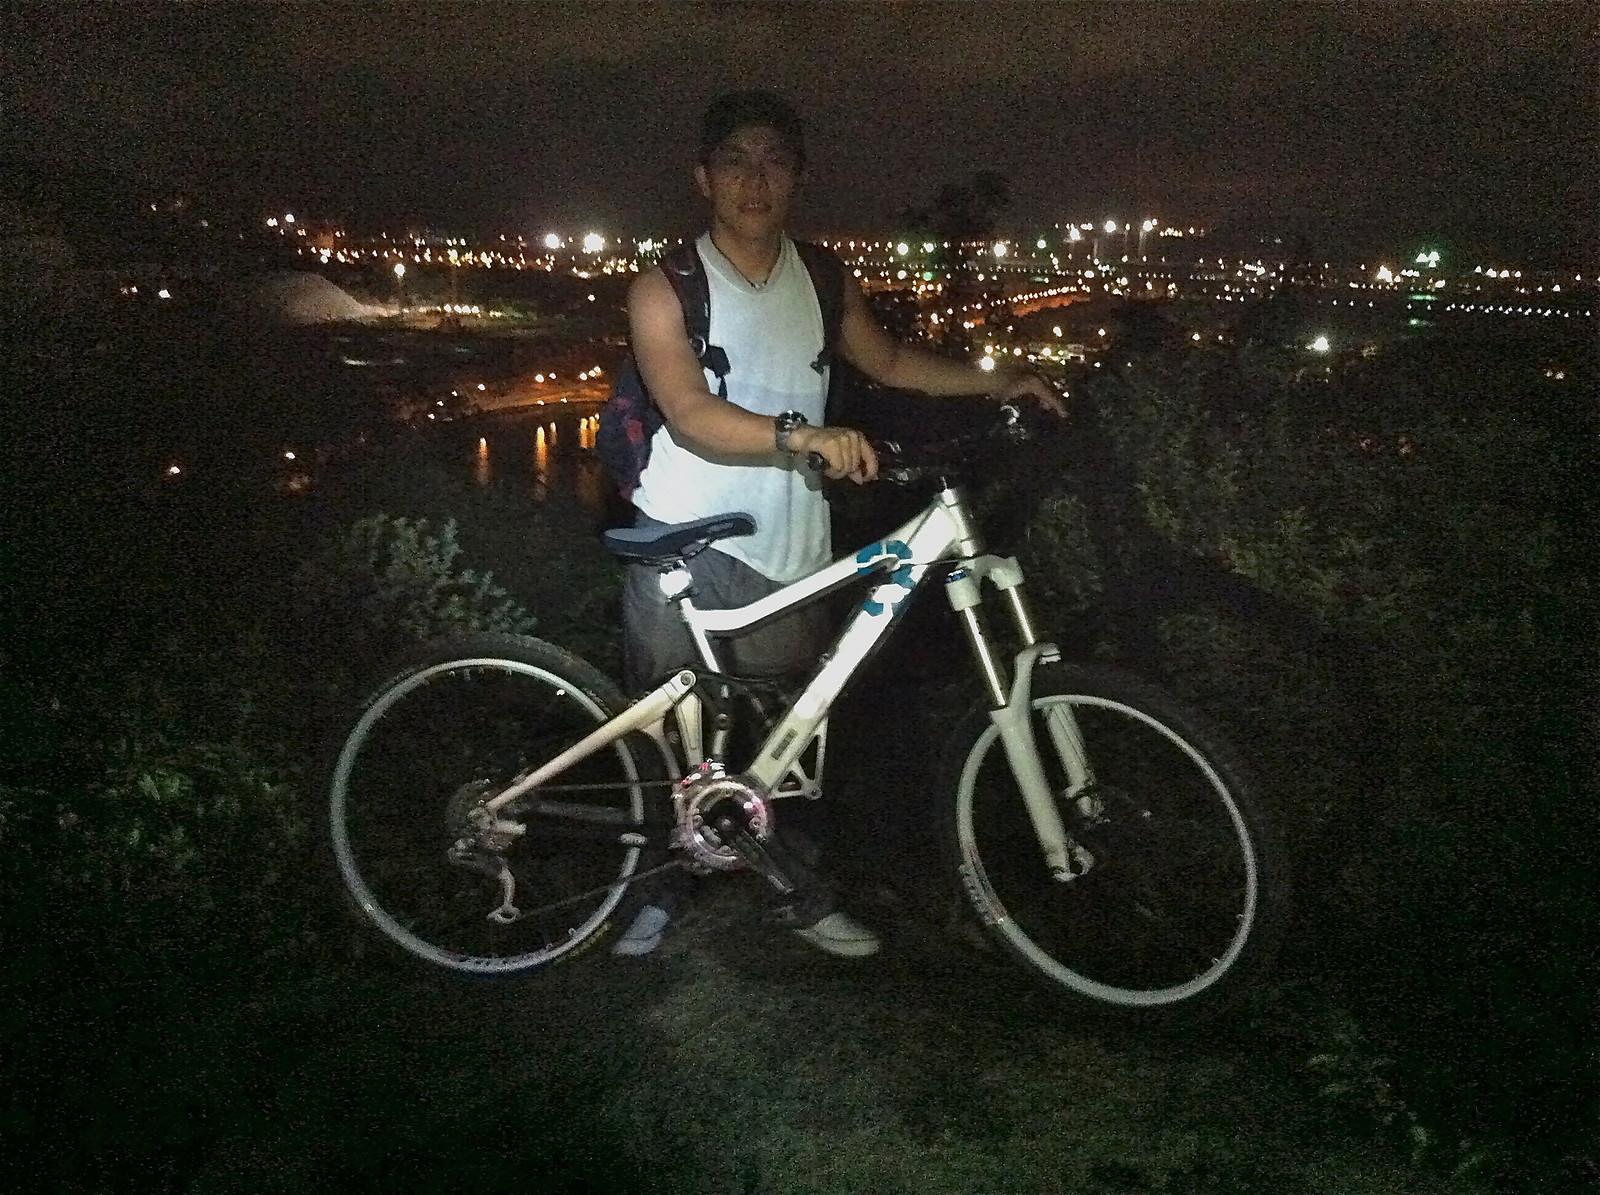 IMG 0802 - ragaboi - Mountain Biking Pictures - Vital MTB